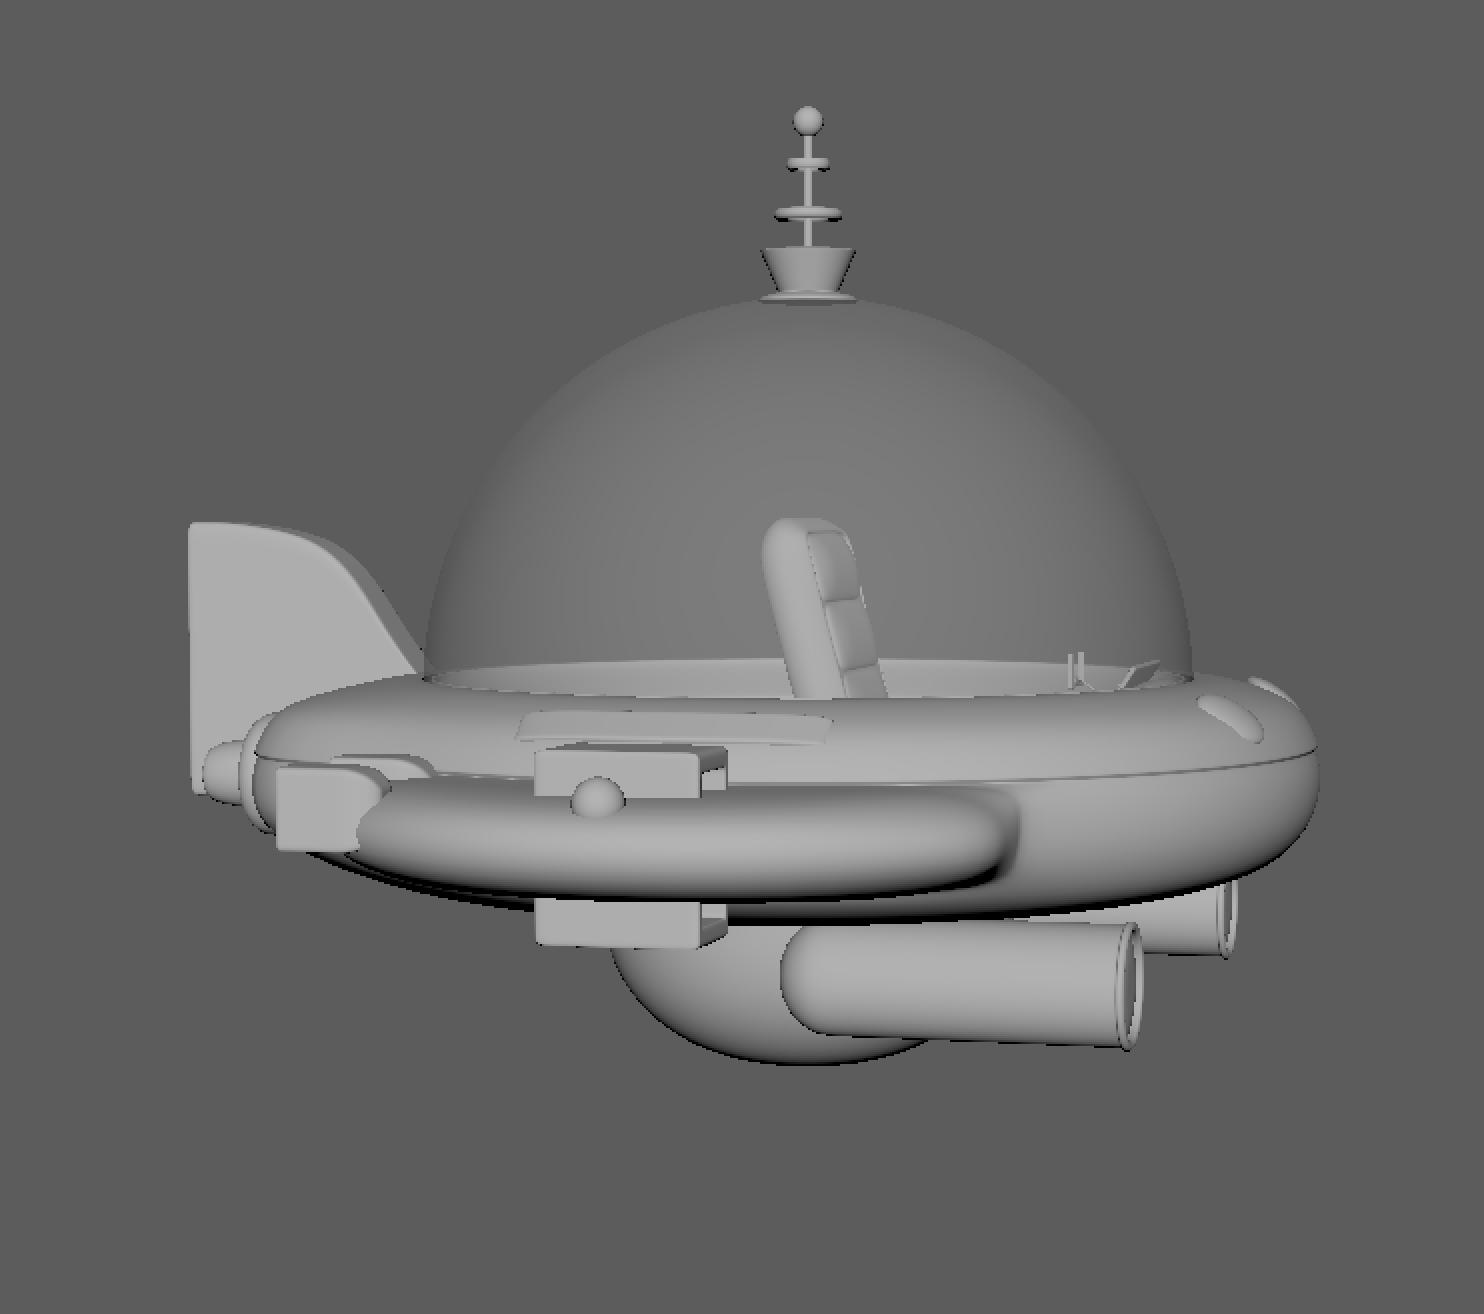 HeroSpaceShip_CGI